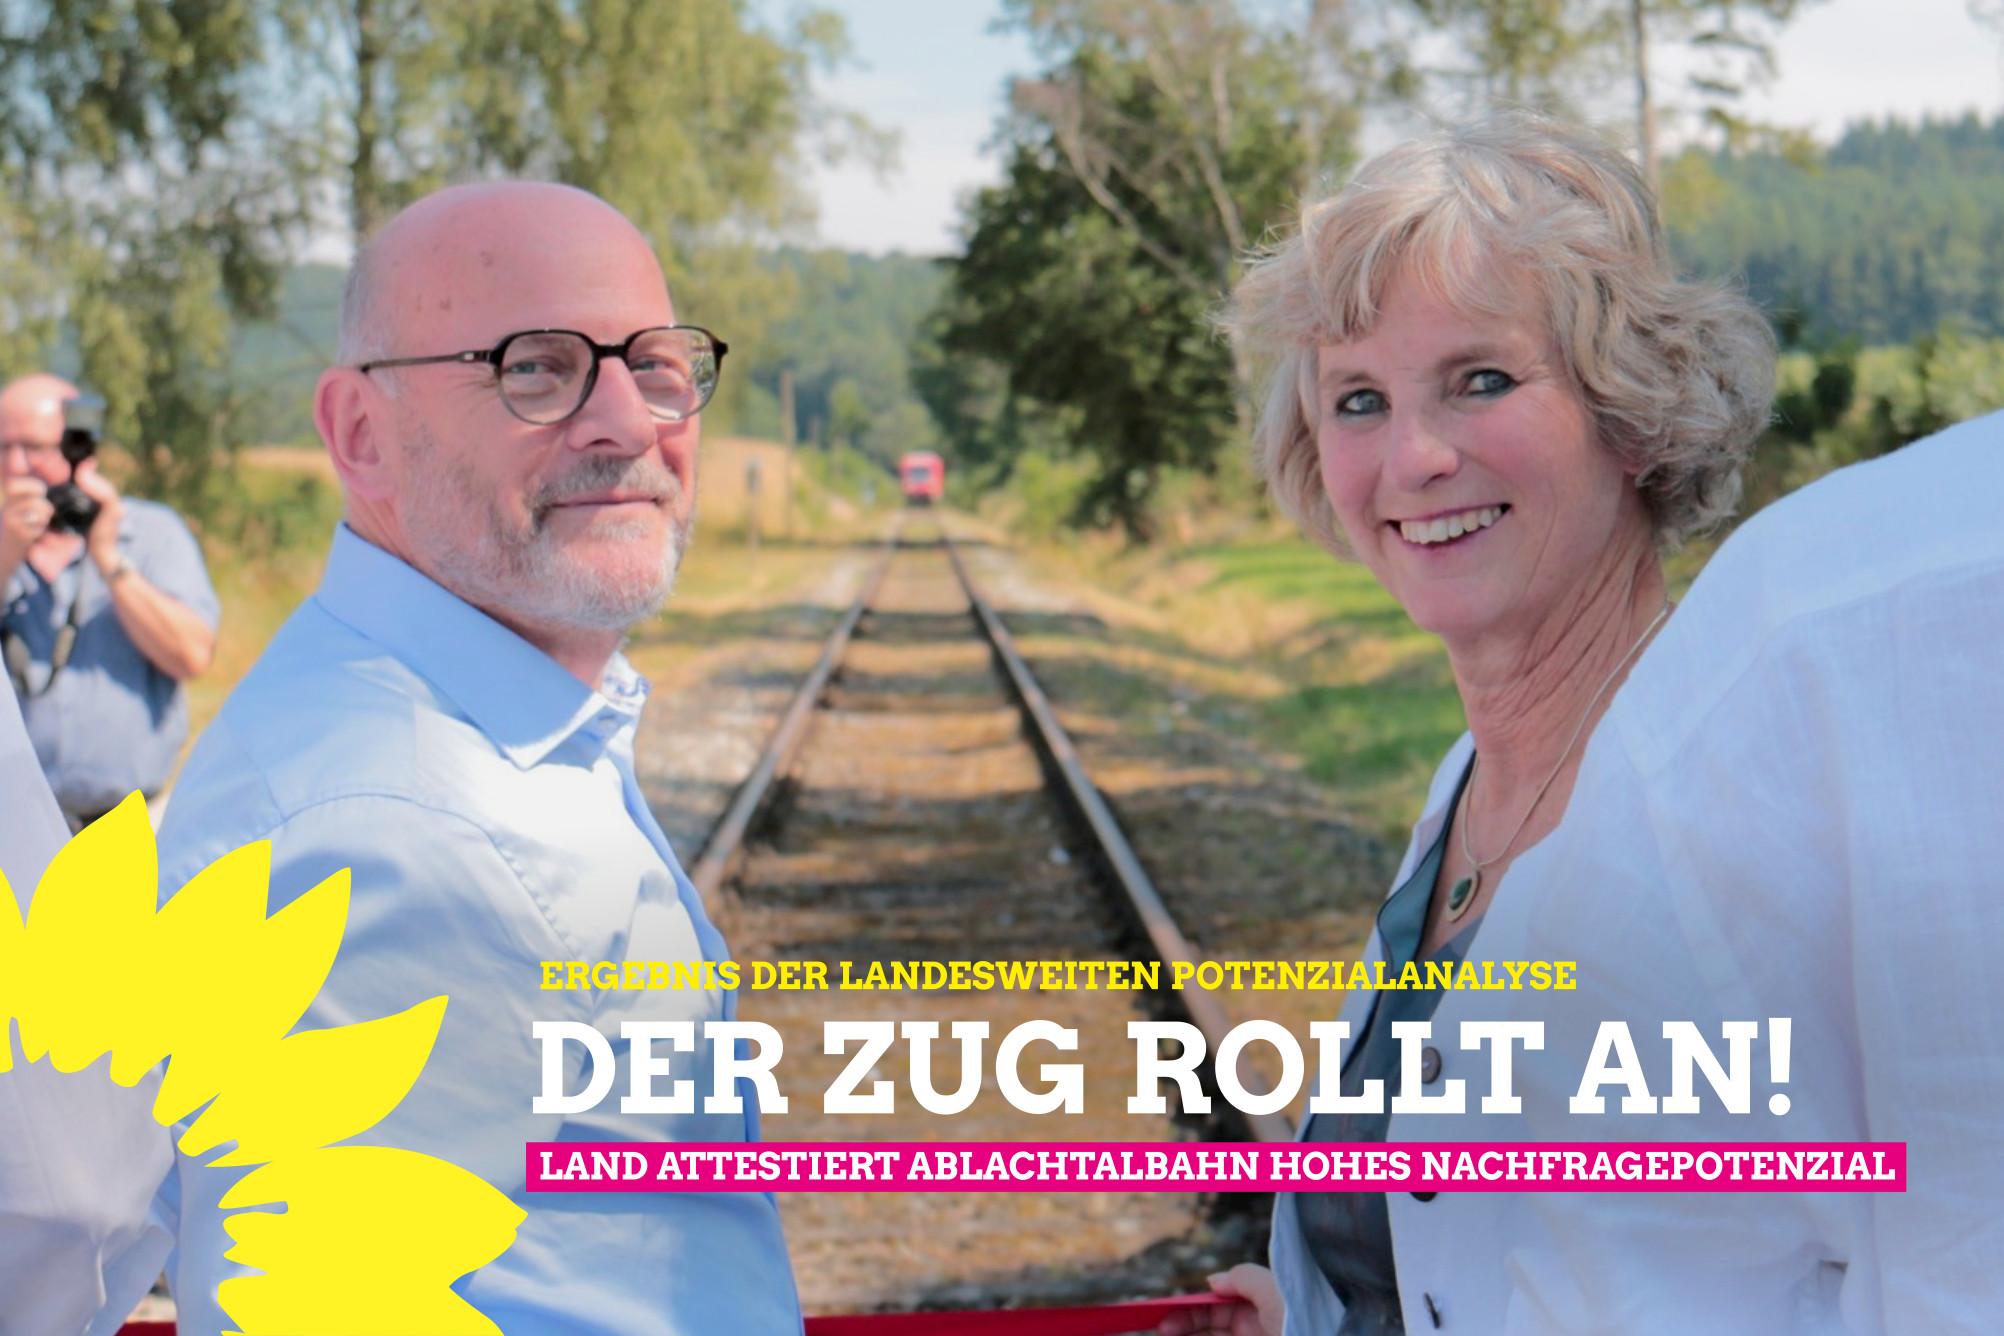 Potenzialanalyse des Verkehrsministeriums attestiert Ablachtalbahn hohes Nachfragepotenzial